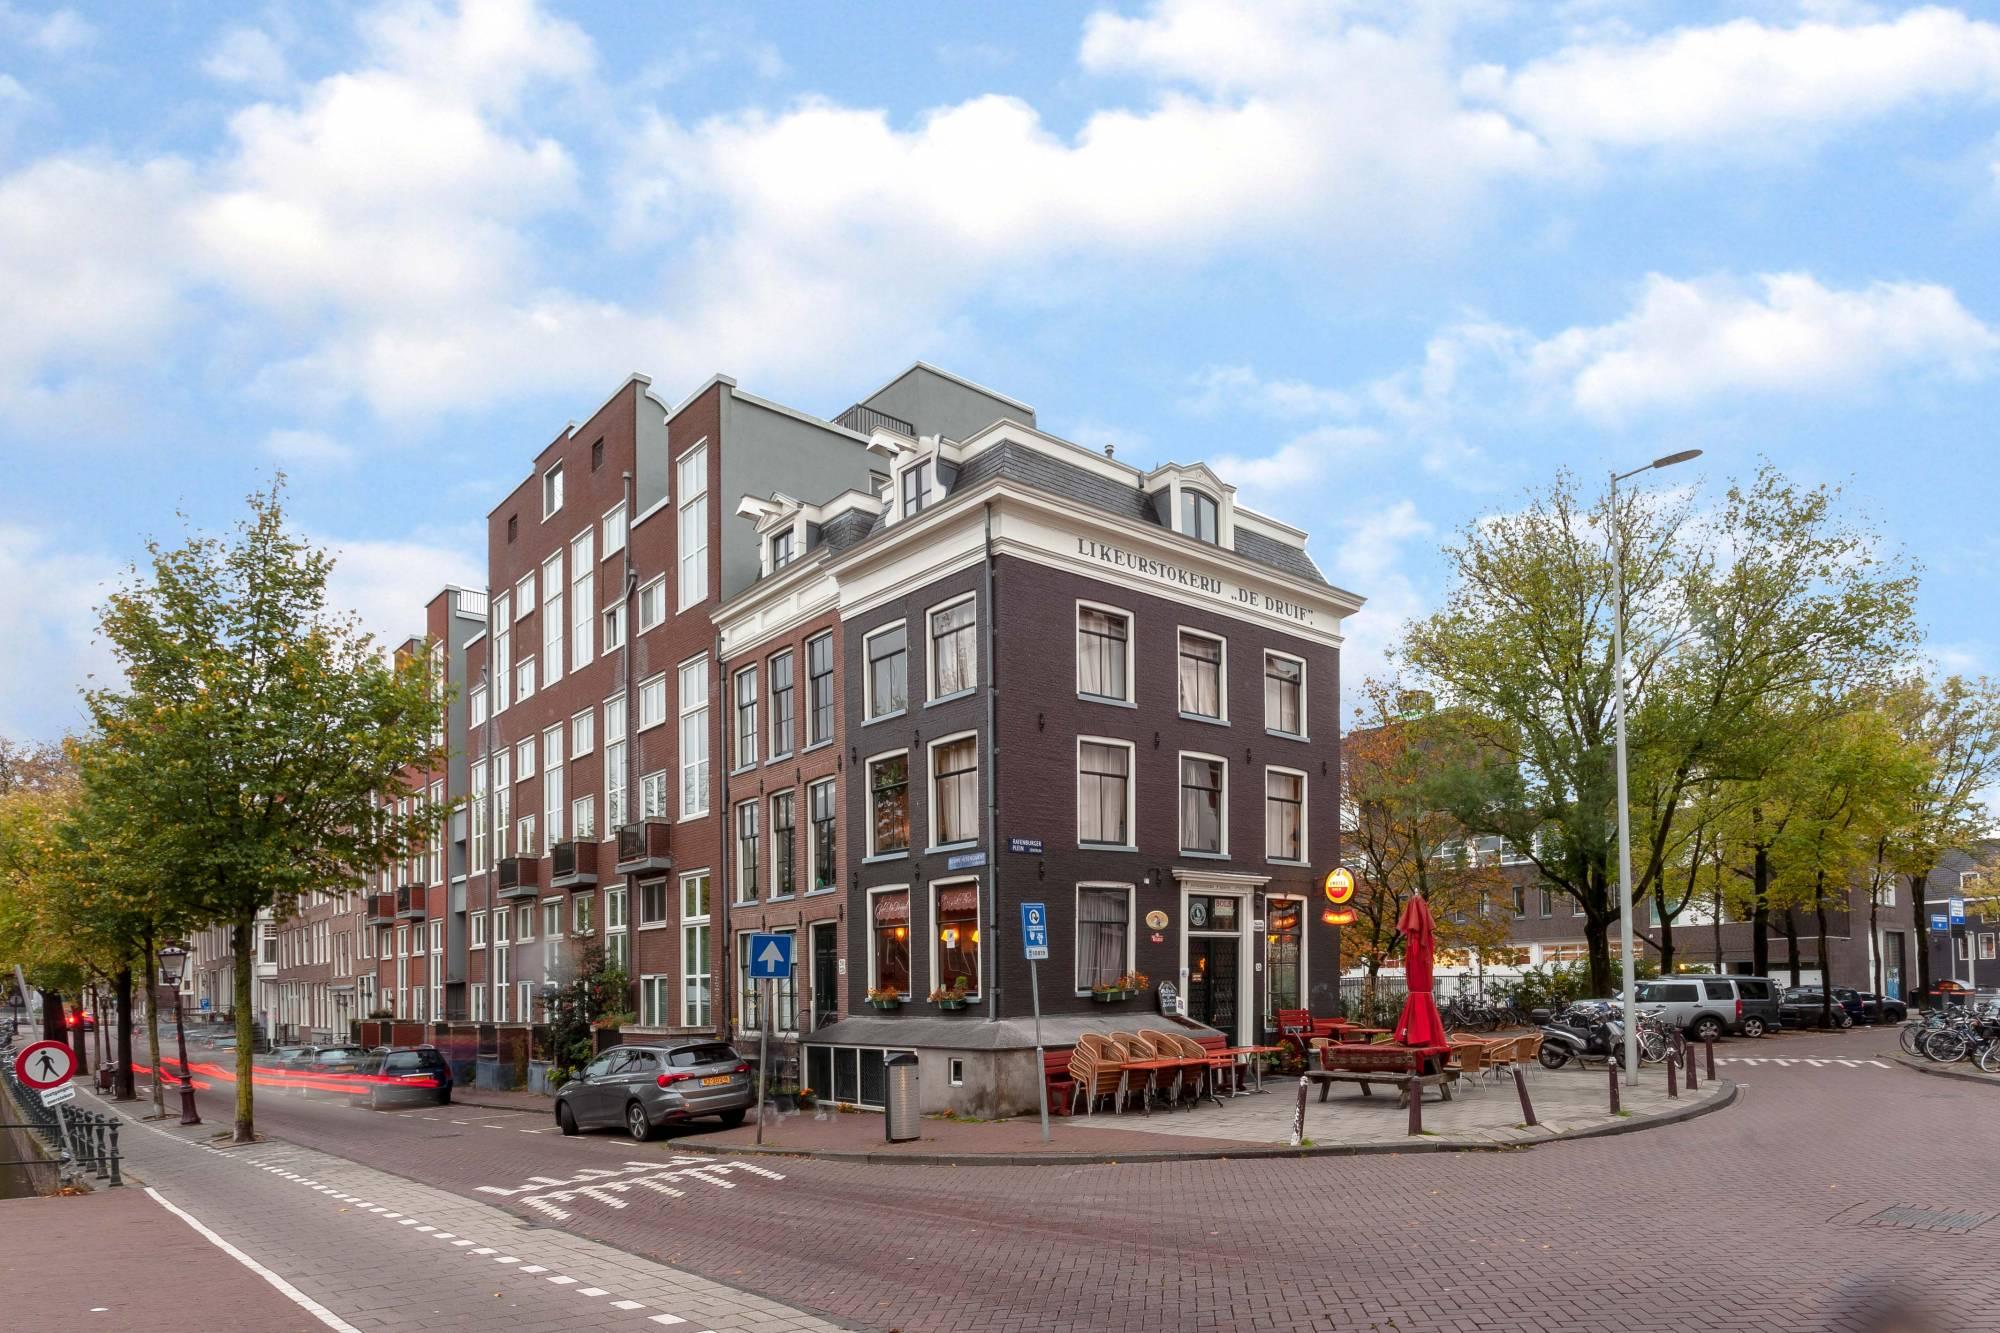 Rapenburgerplein / Amsterdam